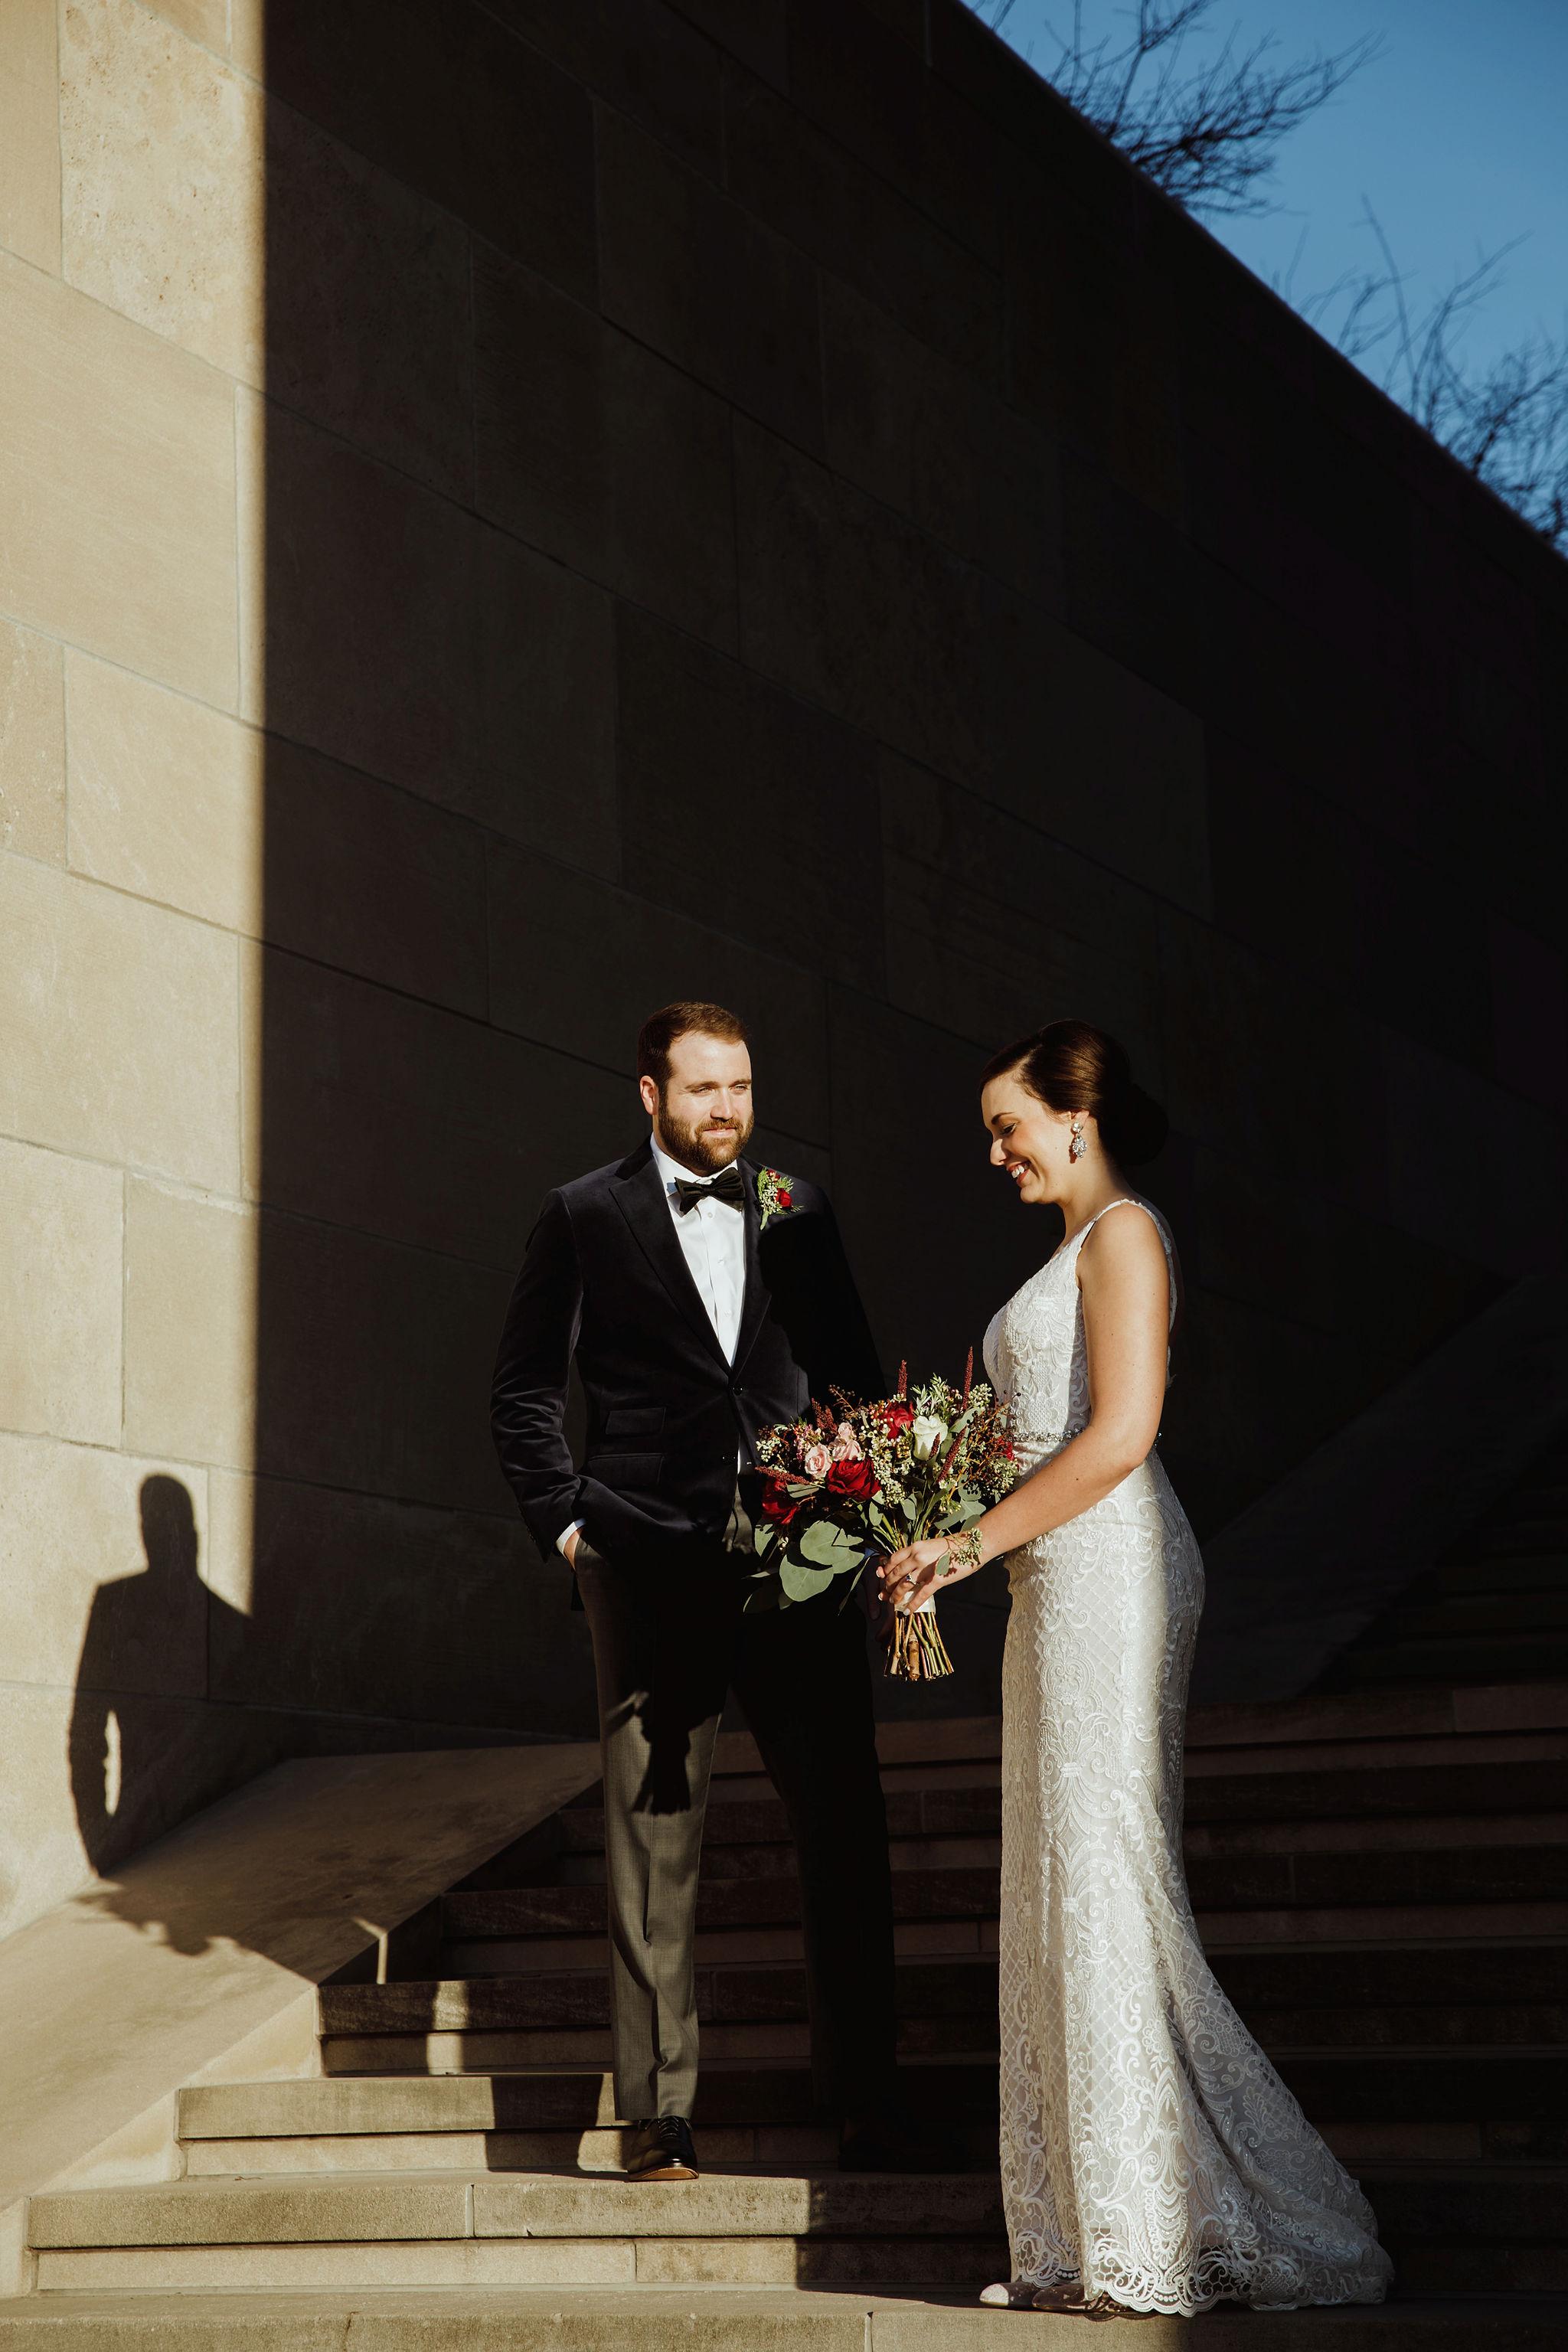 Loose Mansion Winter Wedding_Kindling Wedding Photography_113.JPG